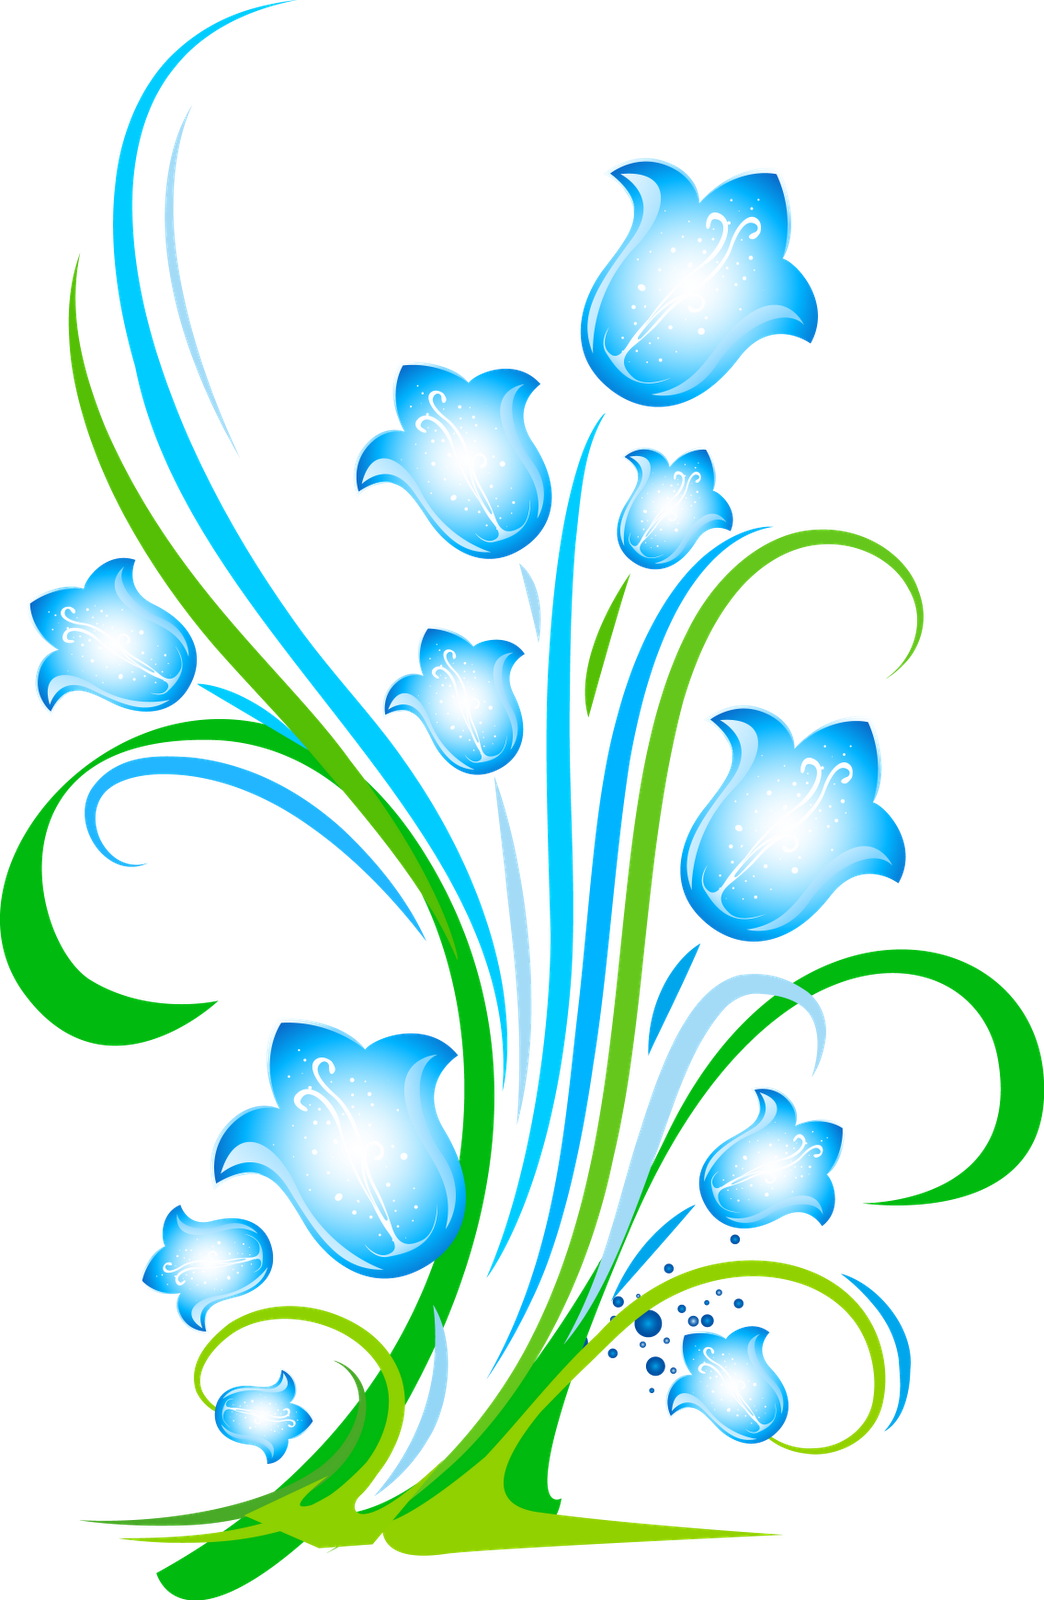 Floral PNG - 14932